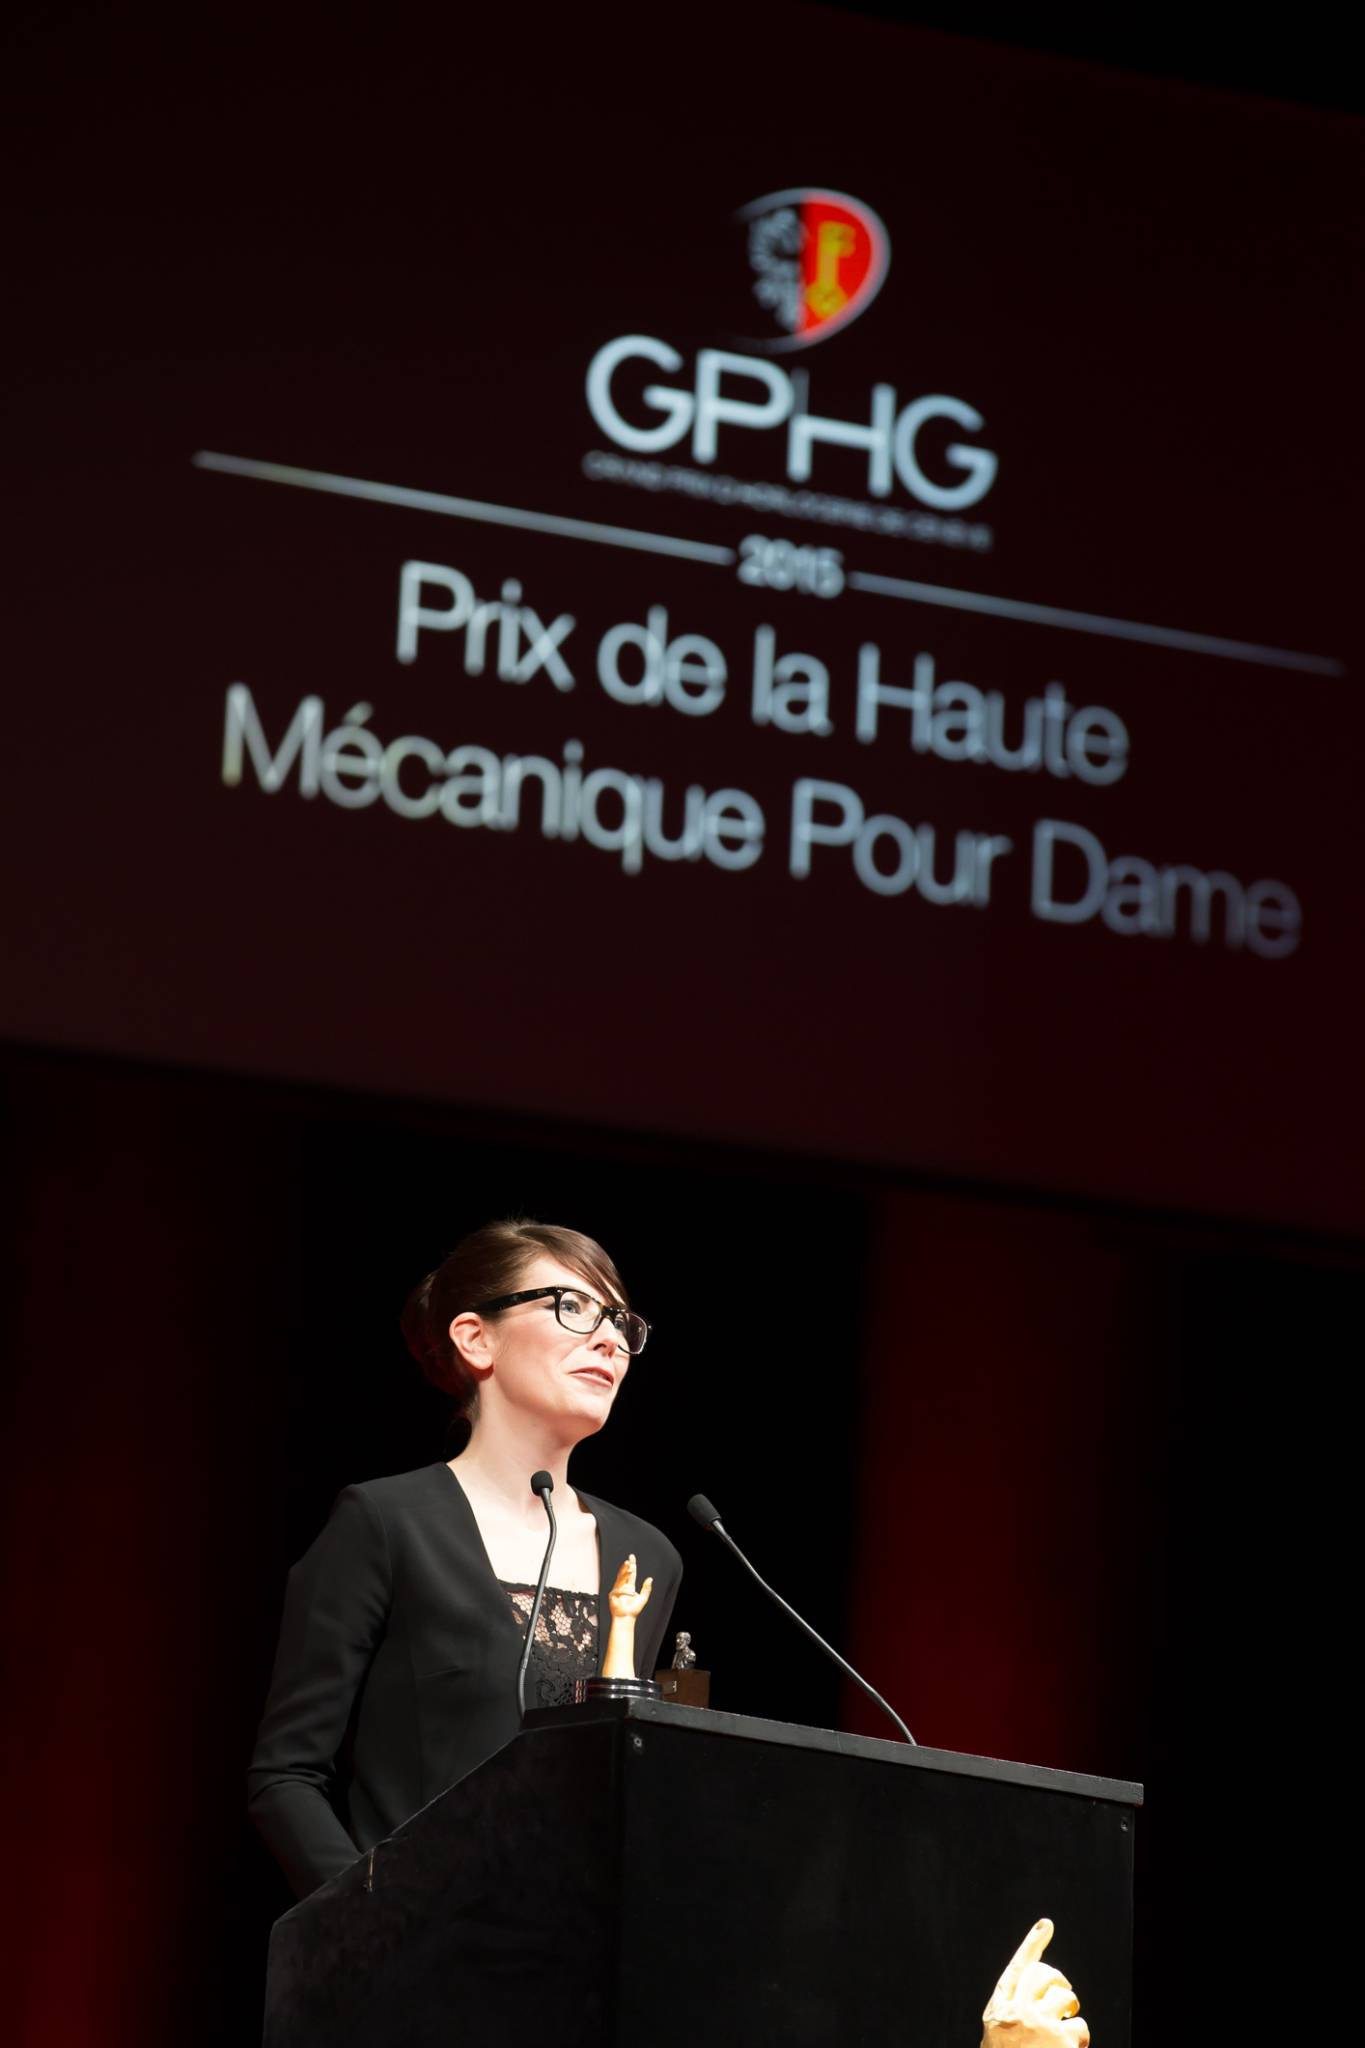 Aurélie Picaud (Timepieces Director of Fabergé, winner of the Ladies' High-Mech Watch Prize 2015)